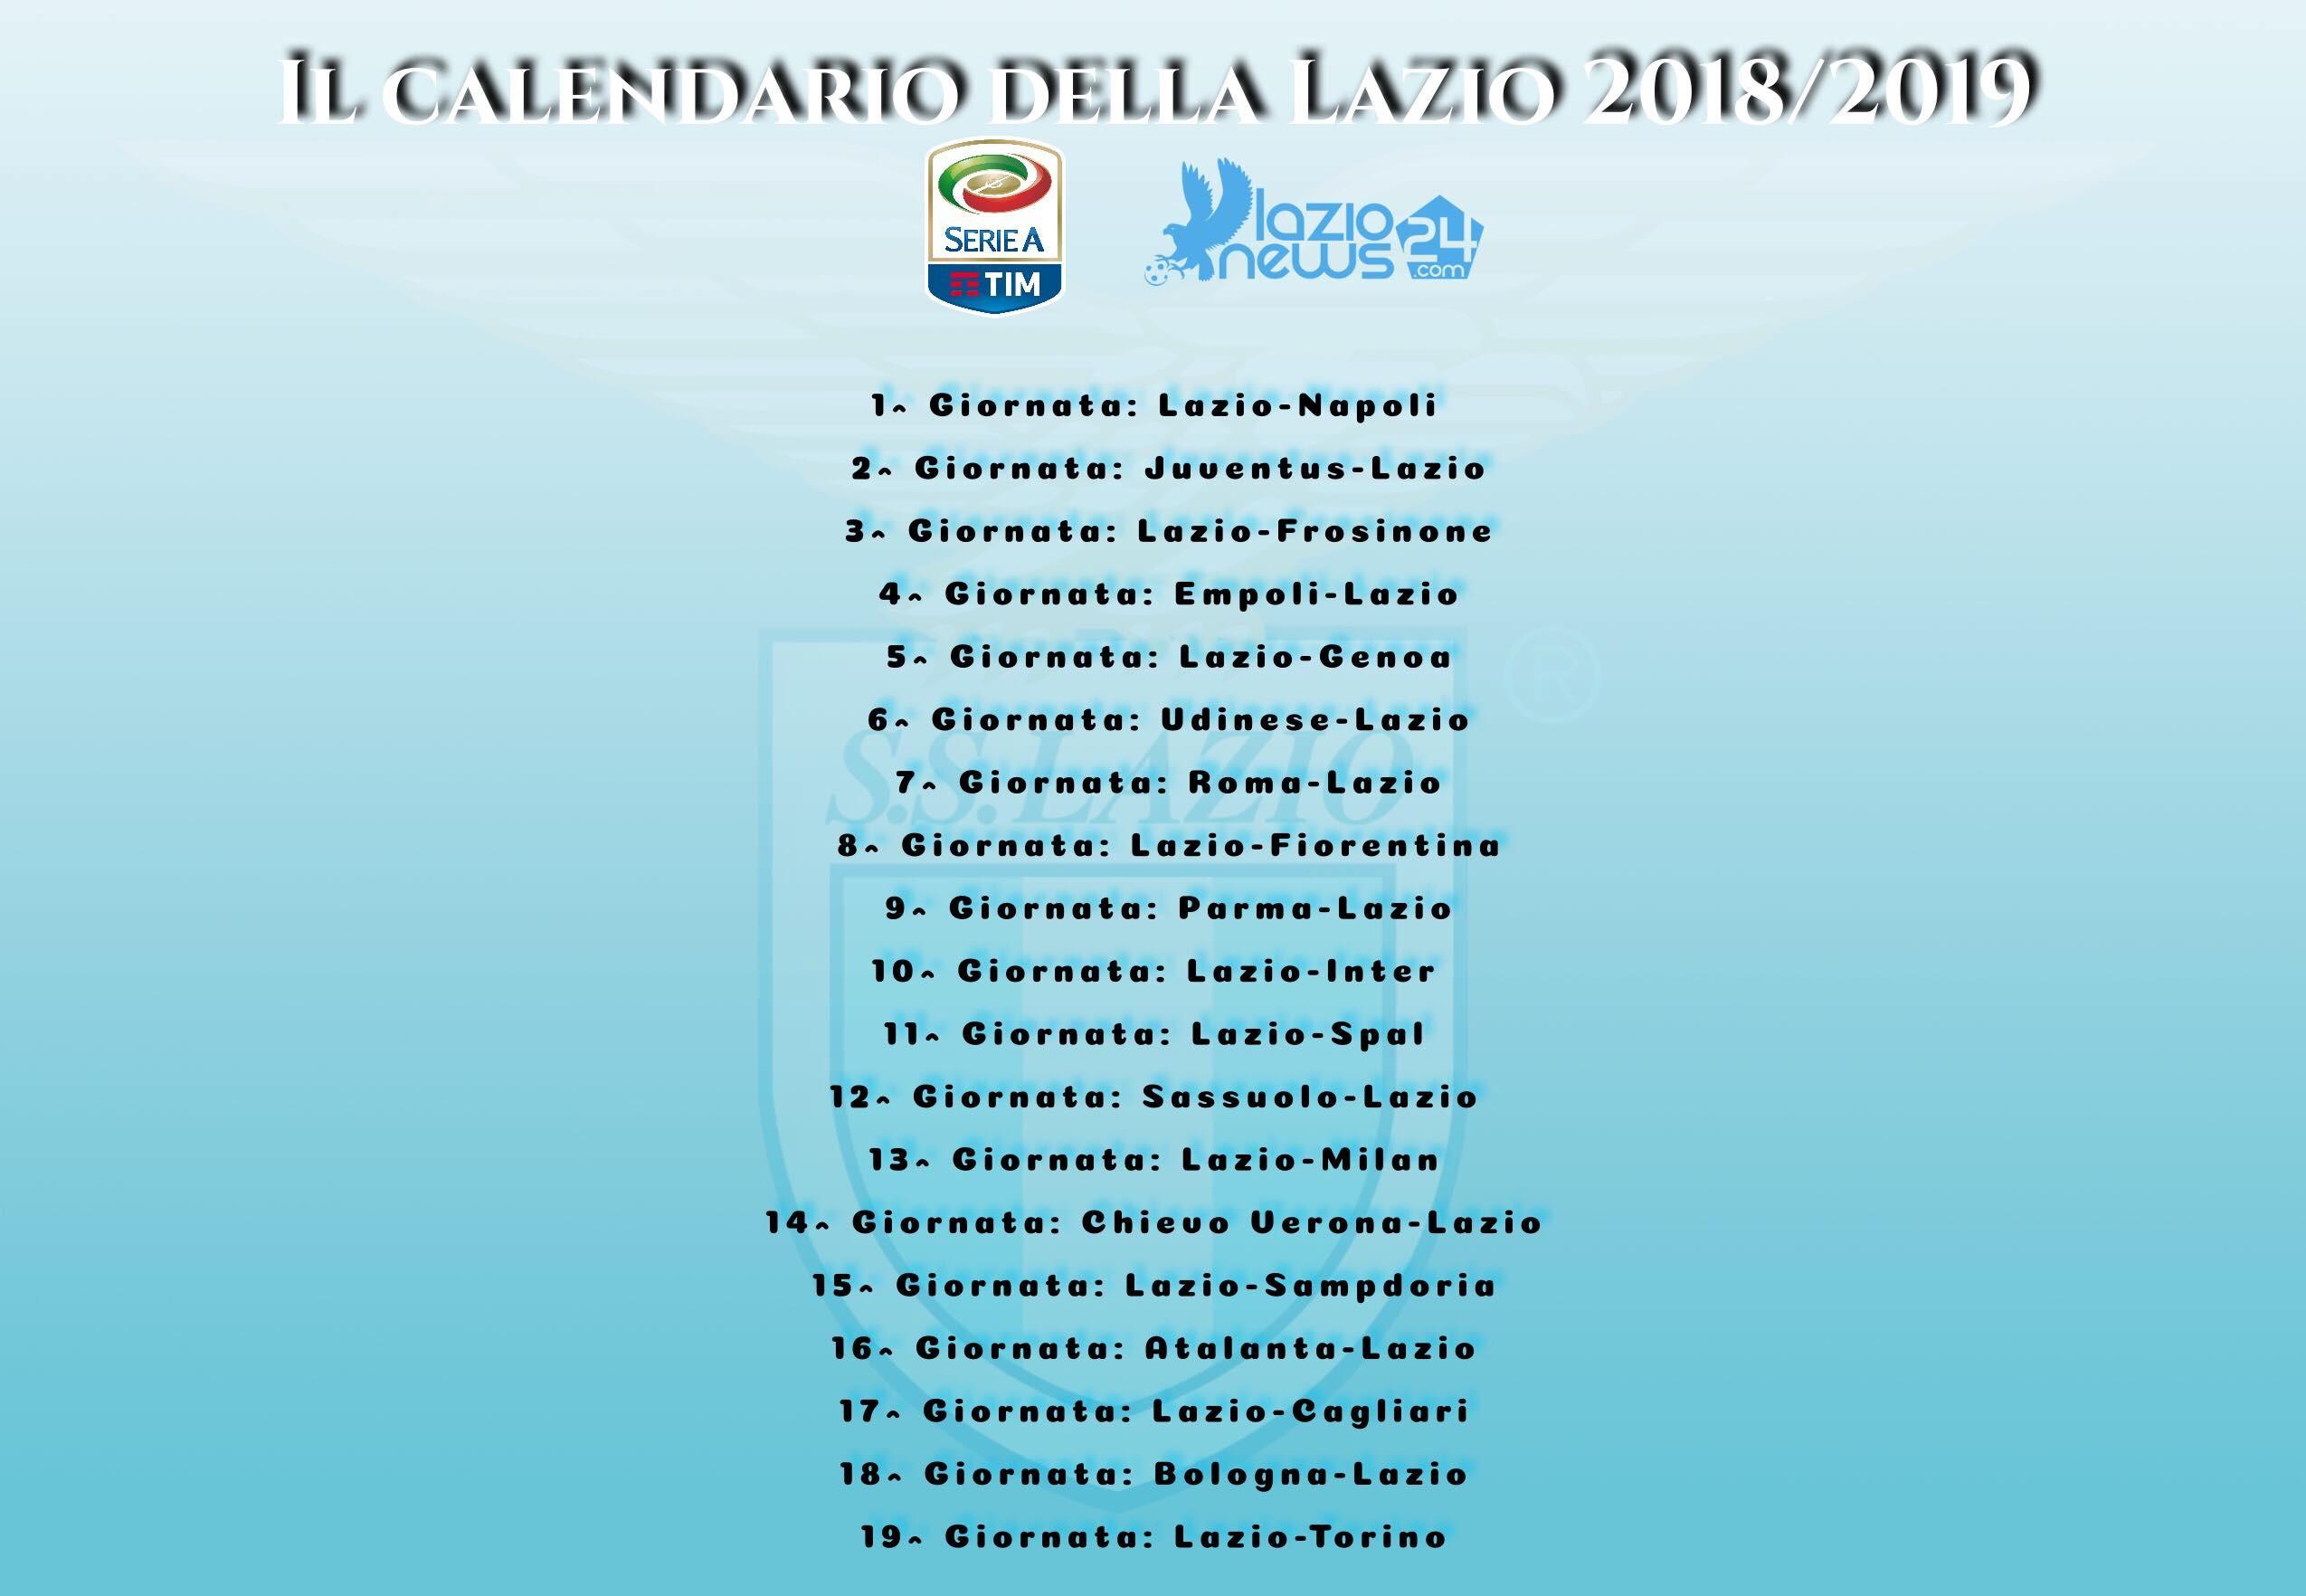 Calendario 2019 Inter Más Recientemente Liberado sorteggio Calendario Serie A 2018 2019 Lazio Napoli All Esordio Of Calendario 2019 Inter Más Recientes Anticipi E Posticipi Serie A 2018 2019 Partite E orari